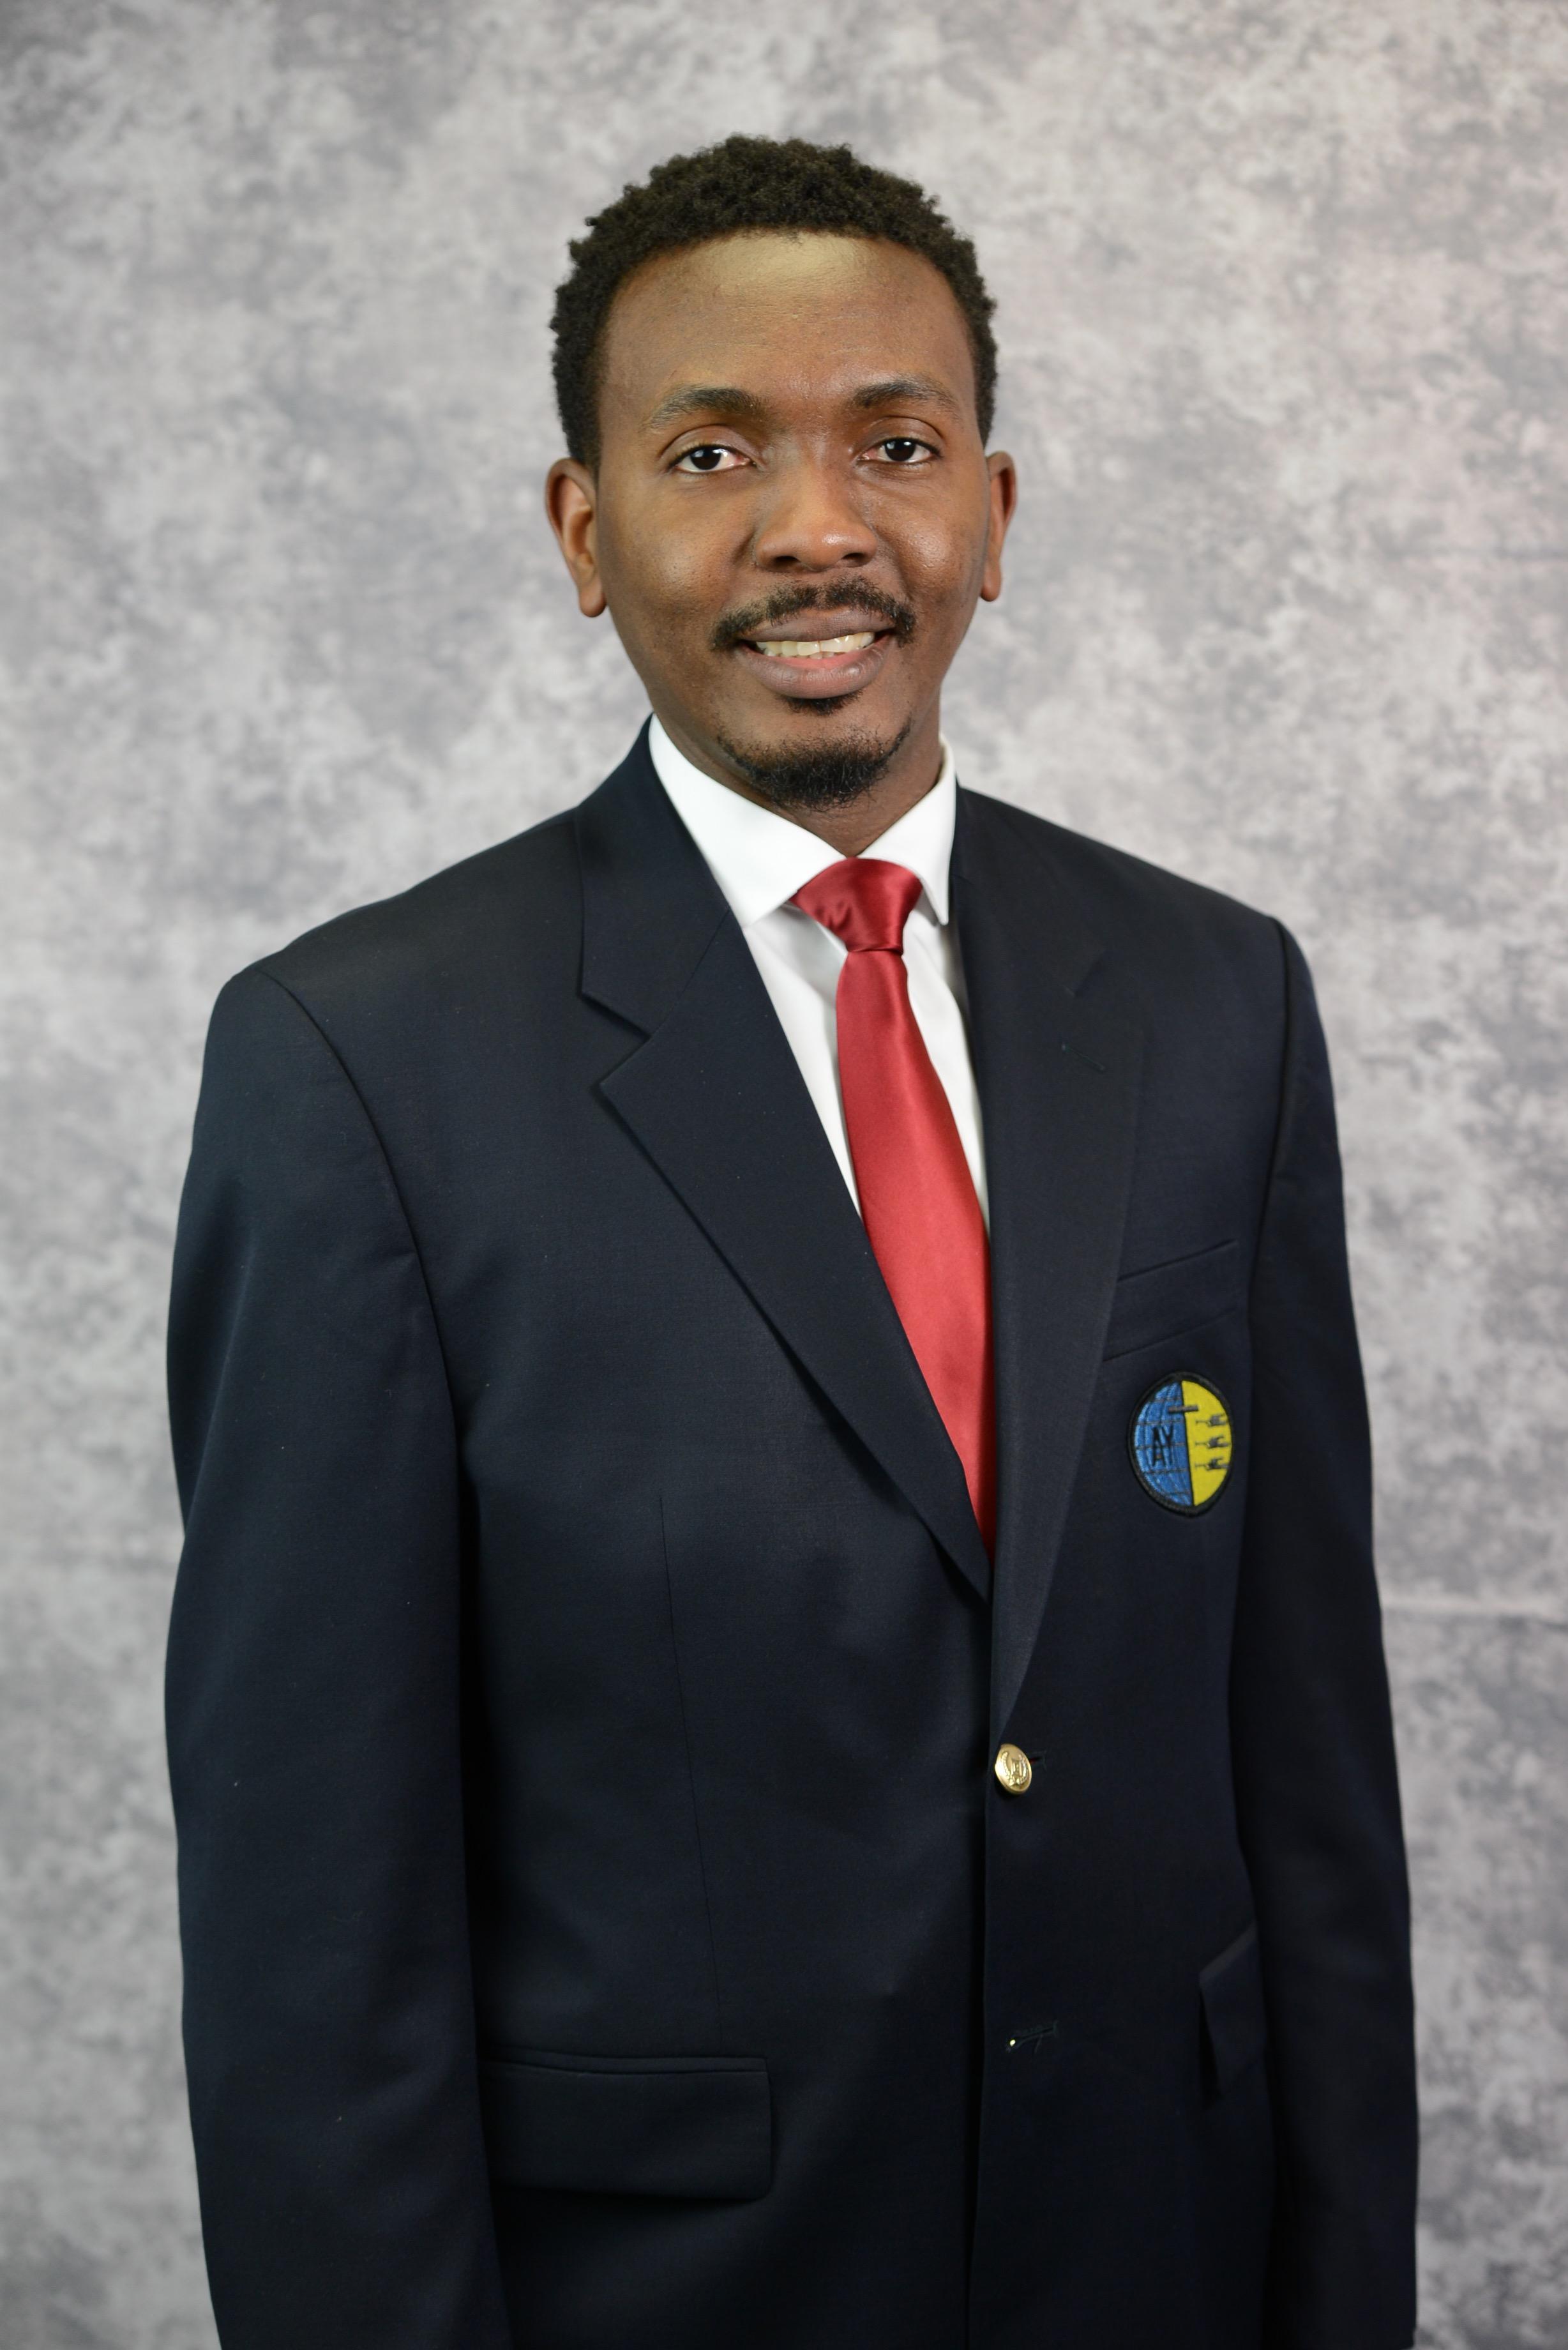 Jason Dryden, Executive Coordinator